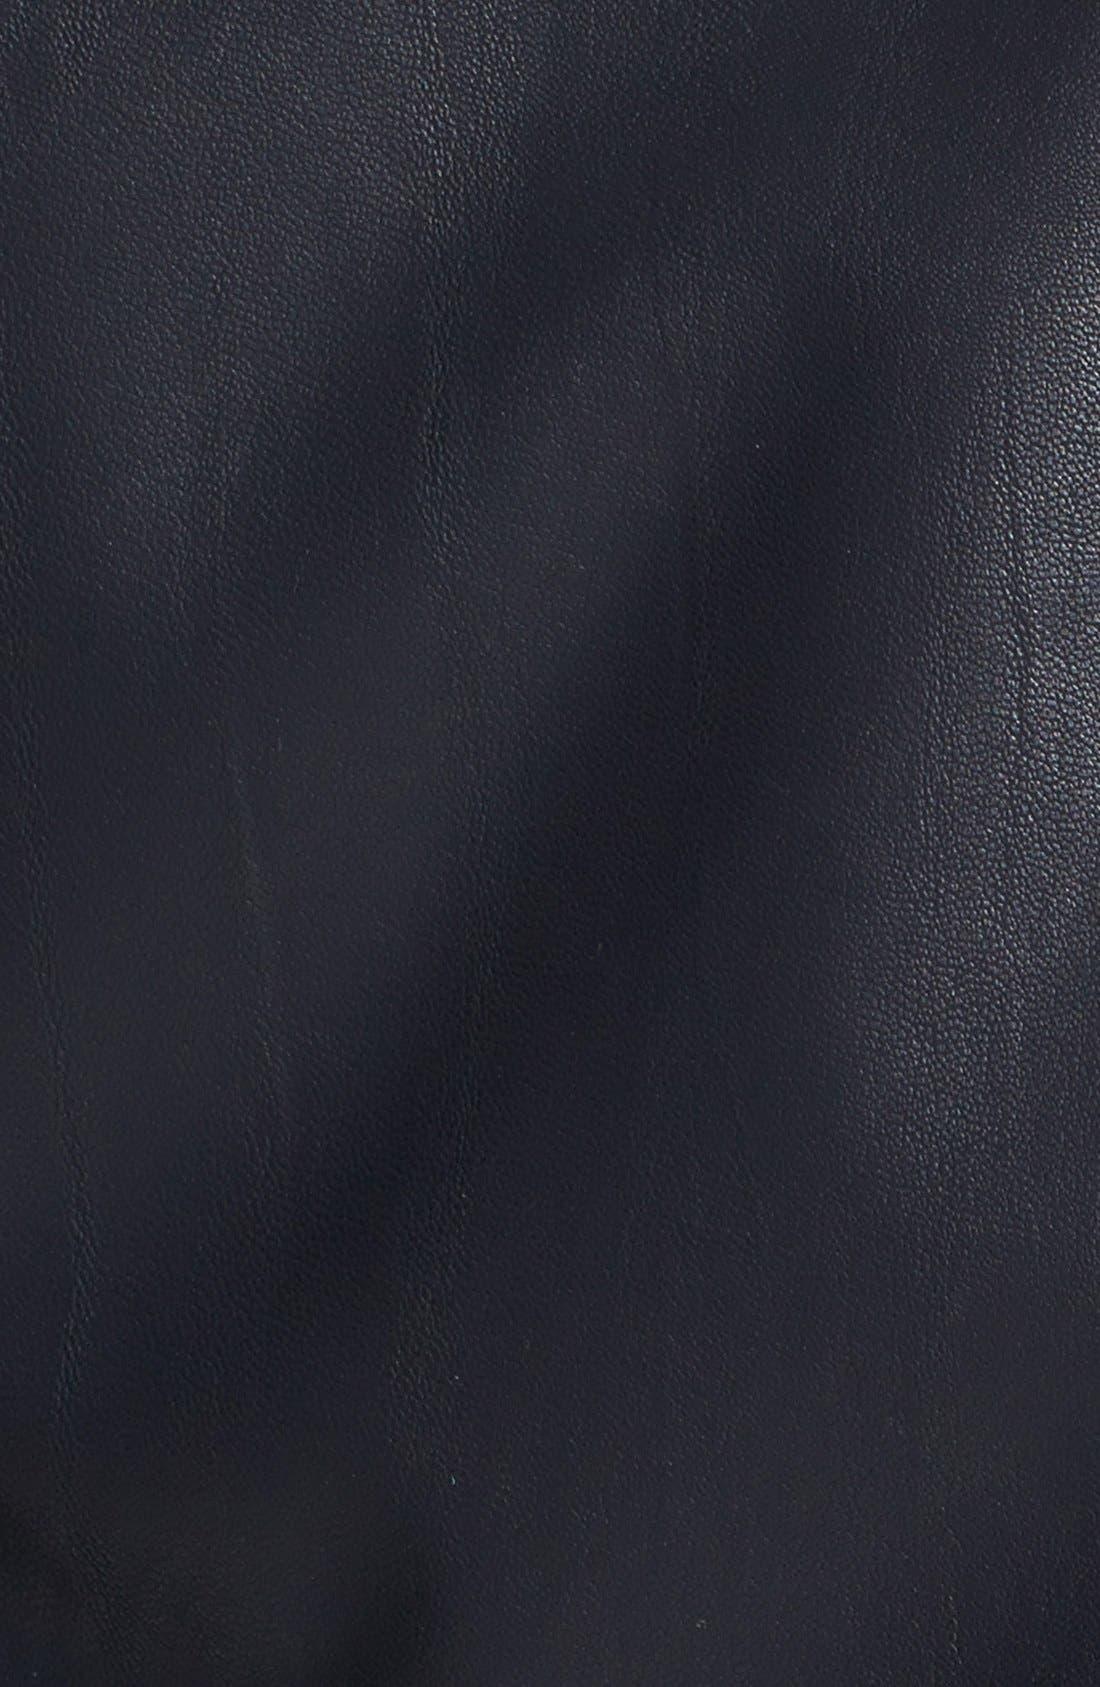 TOPSHOP, 'Wylde' Faux Leather Biker Jacket, Alternate thumbnail 3, color, 001